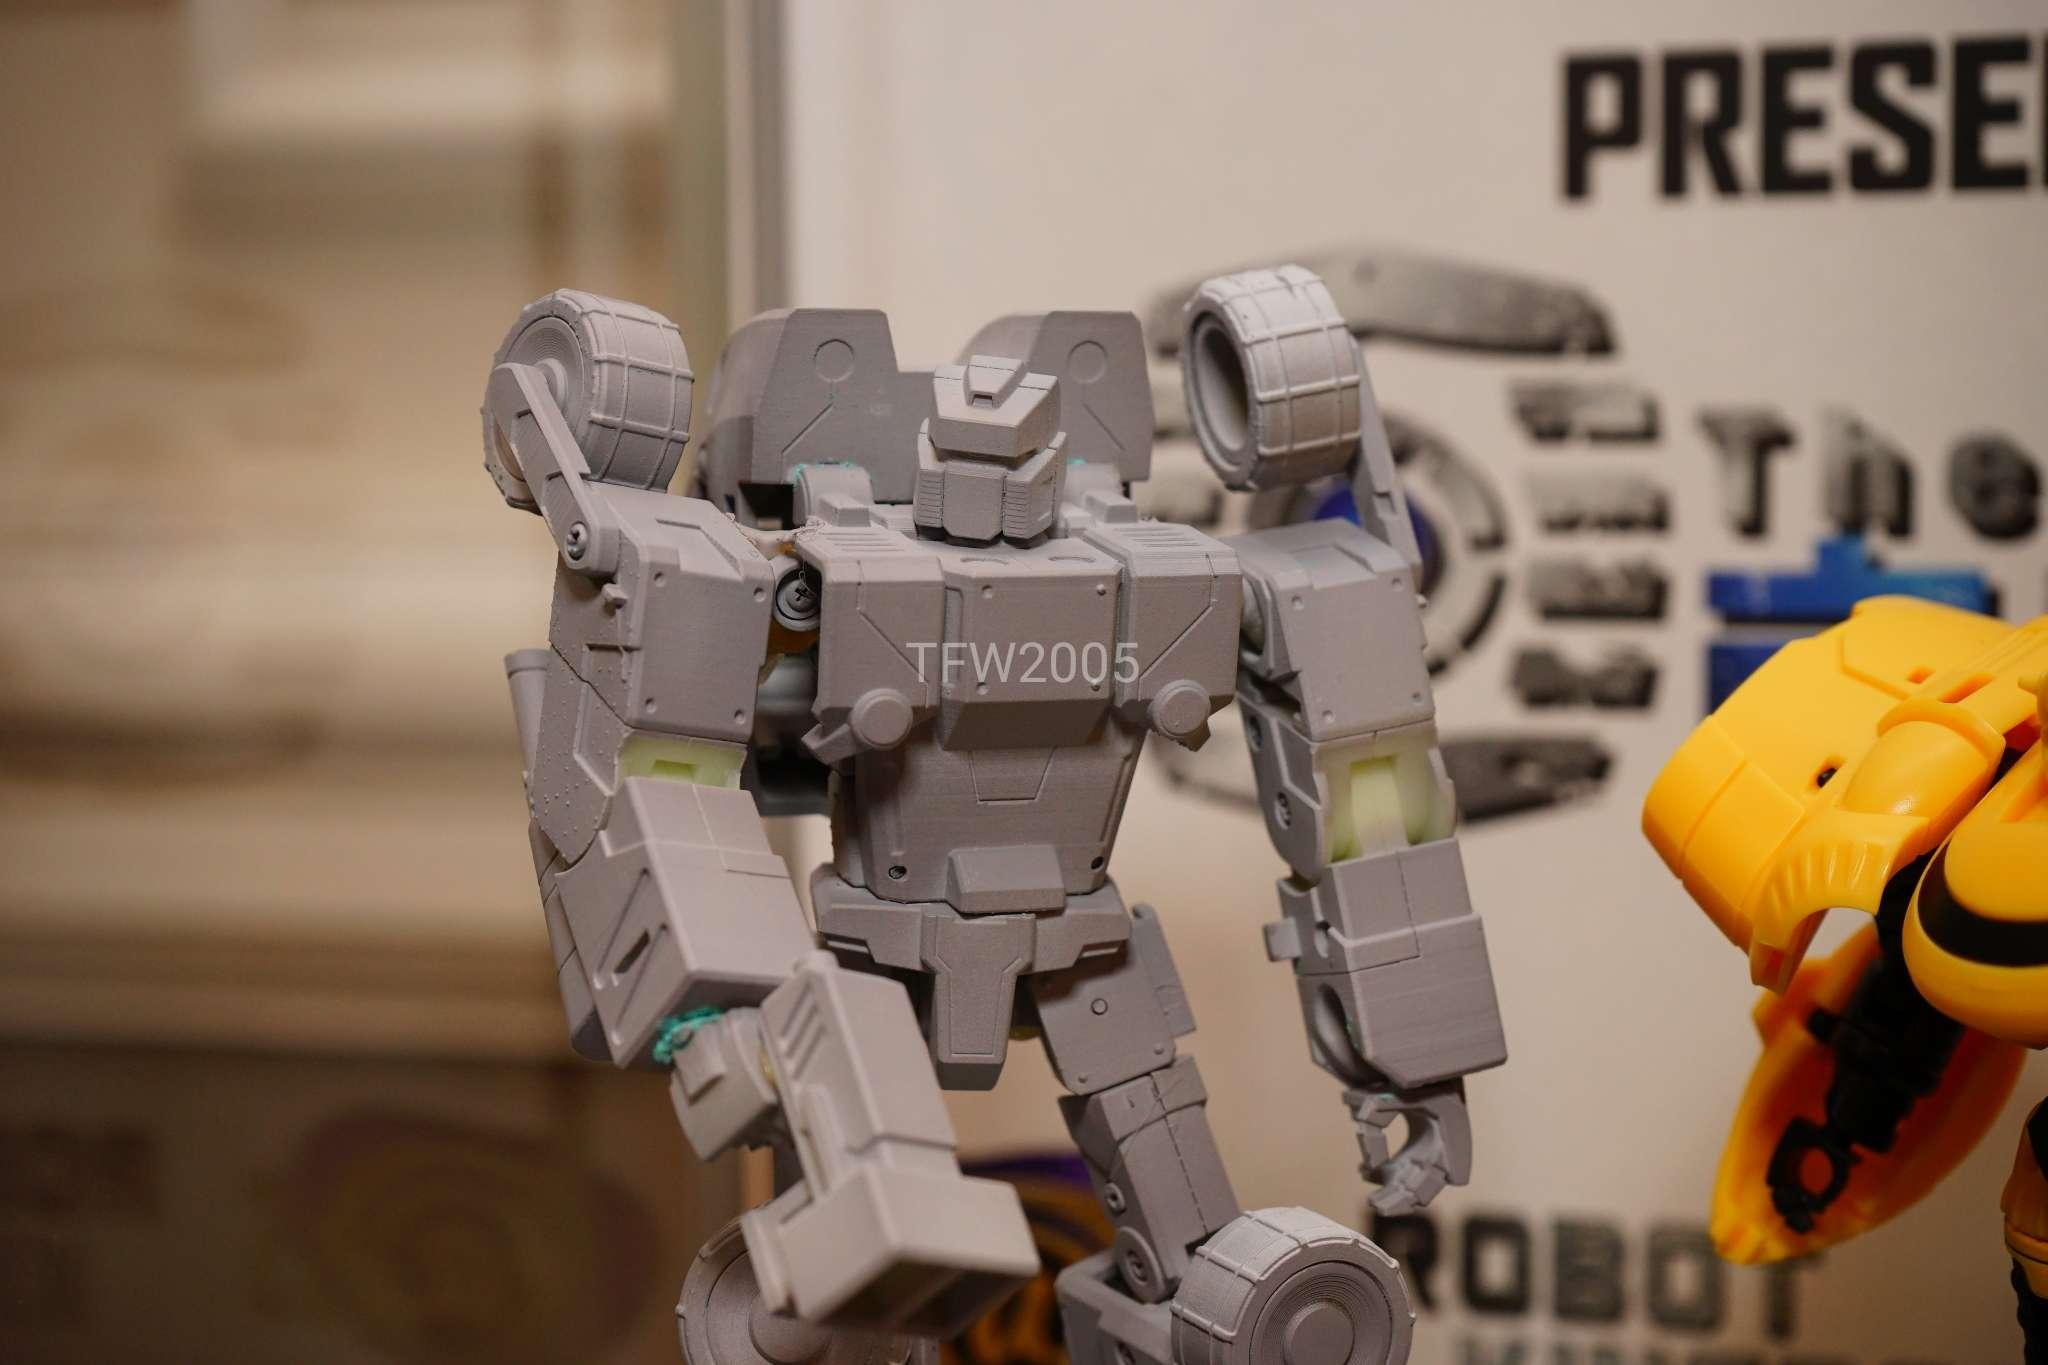 [MAAS Toys] Produit Tiers - Jouets TF de la gamme Cybertech Series (mode Cybertronien) + Gee Too (G2) 9CwTIaL8_o